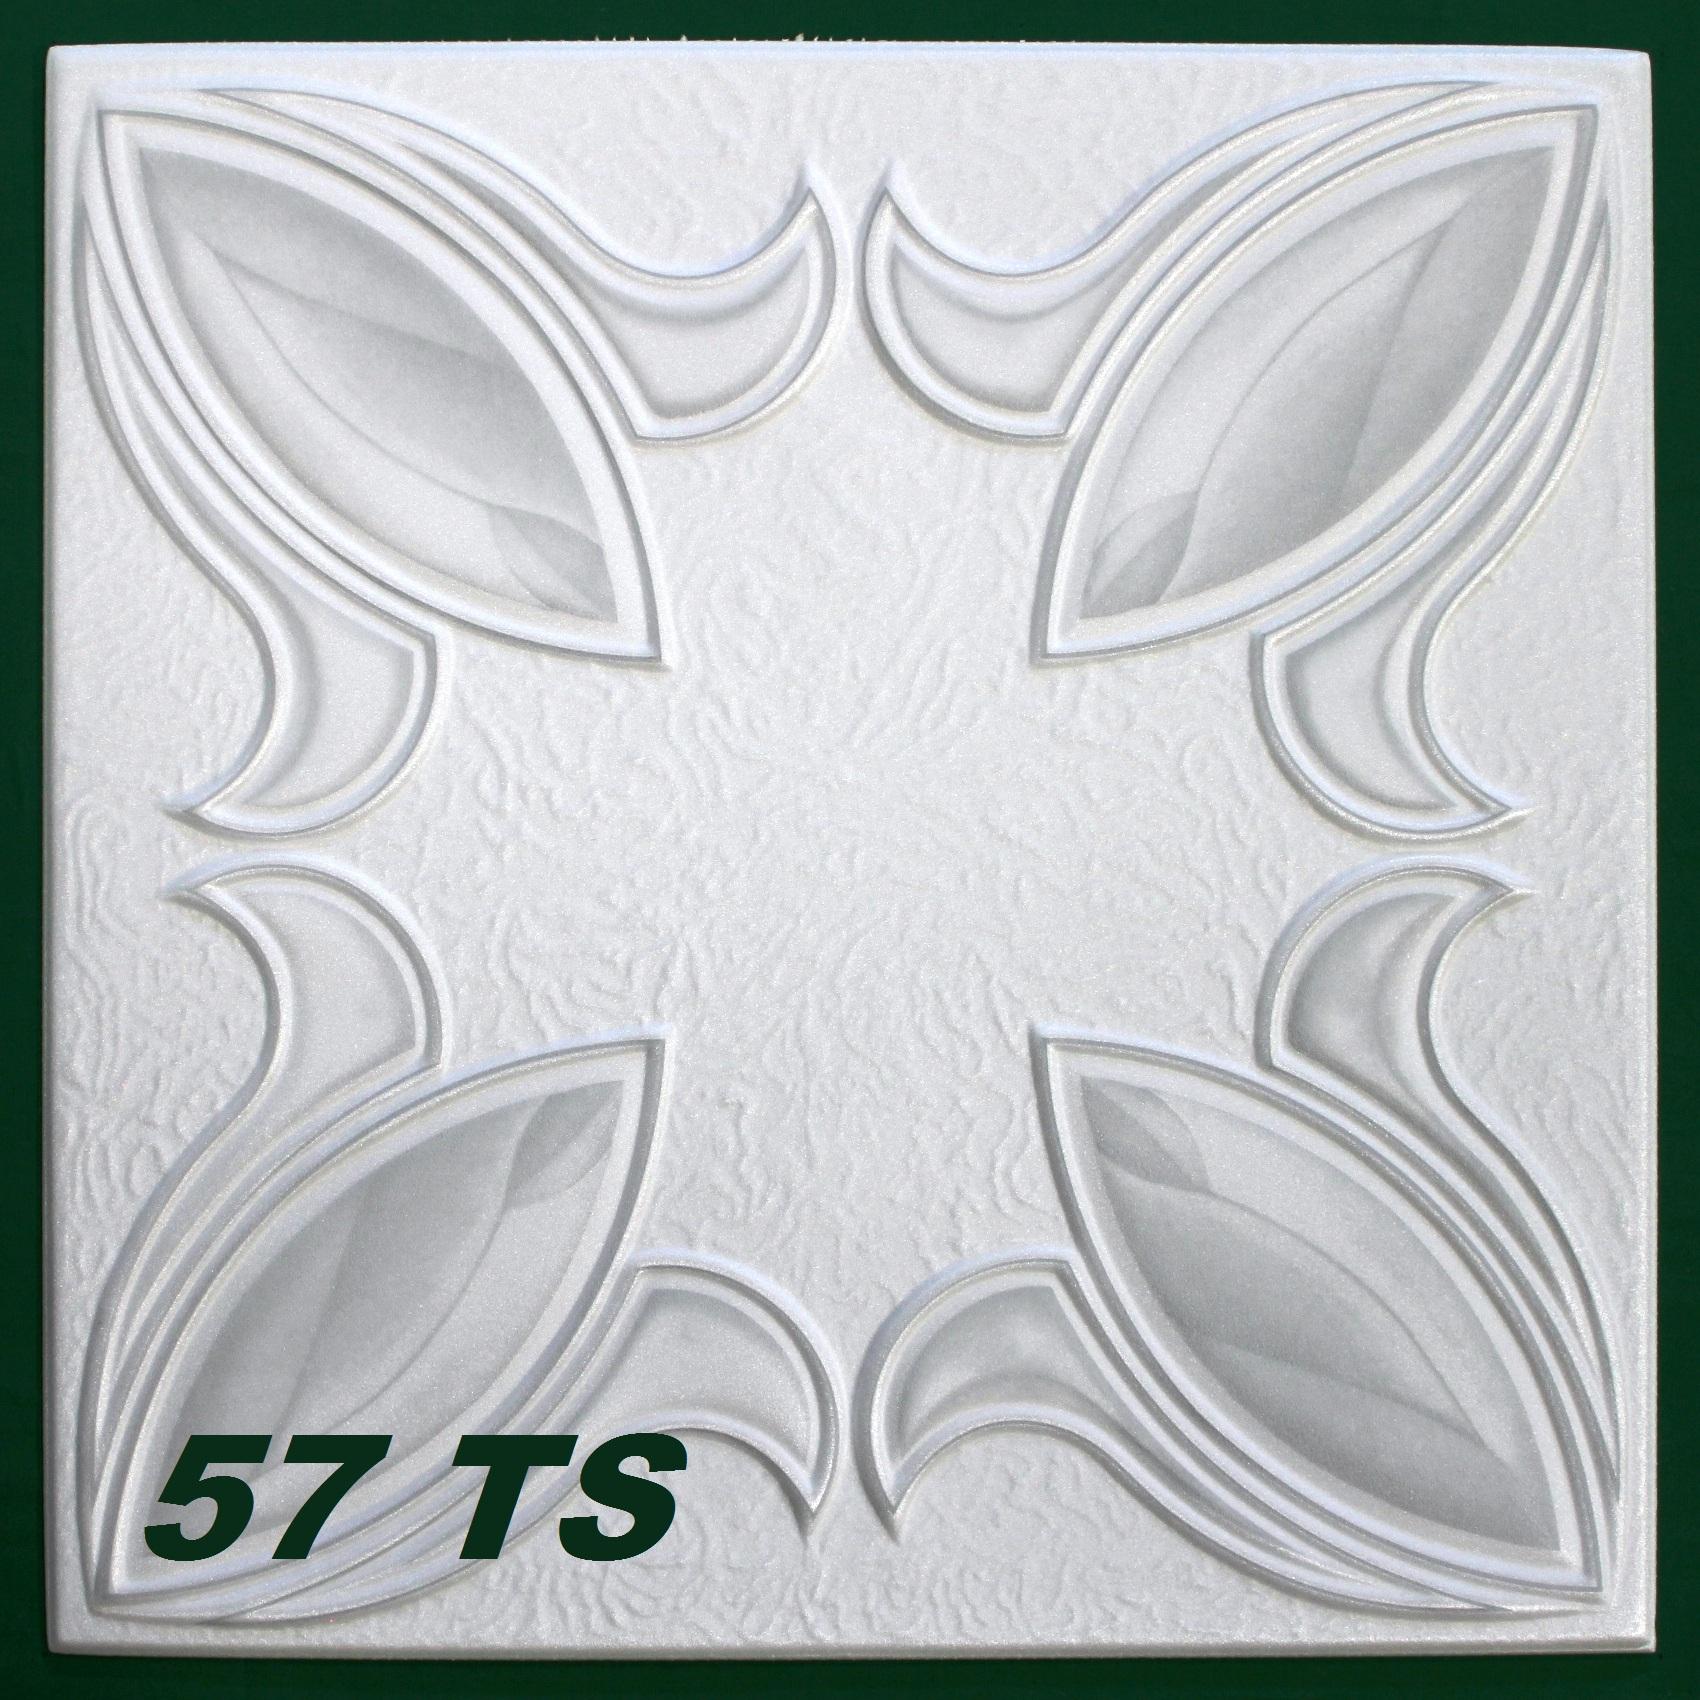 1 m2 deckenplatten styroporplatten stuck farbige platten 50x50cm ts ebay. Black Bedroom Furniture Sets. Home Design Ideas